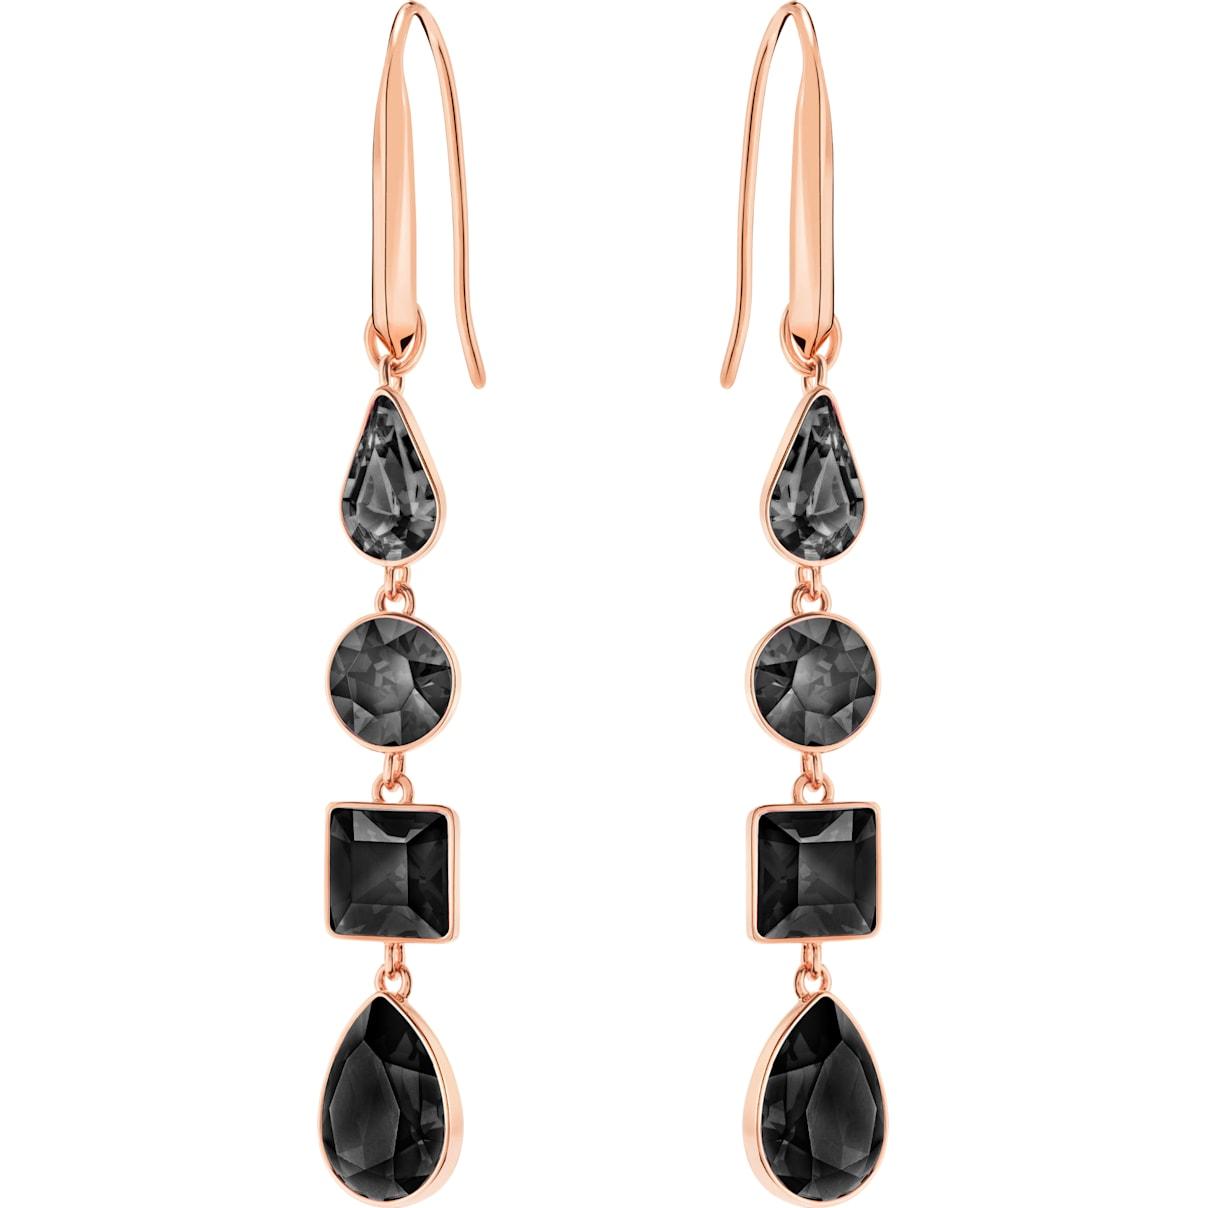 Swarovski Lisanne Pierced Earrings, Black, Rose-gold tone plated